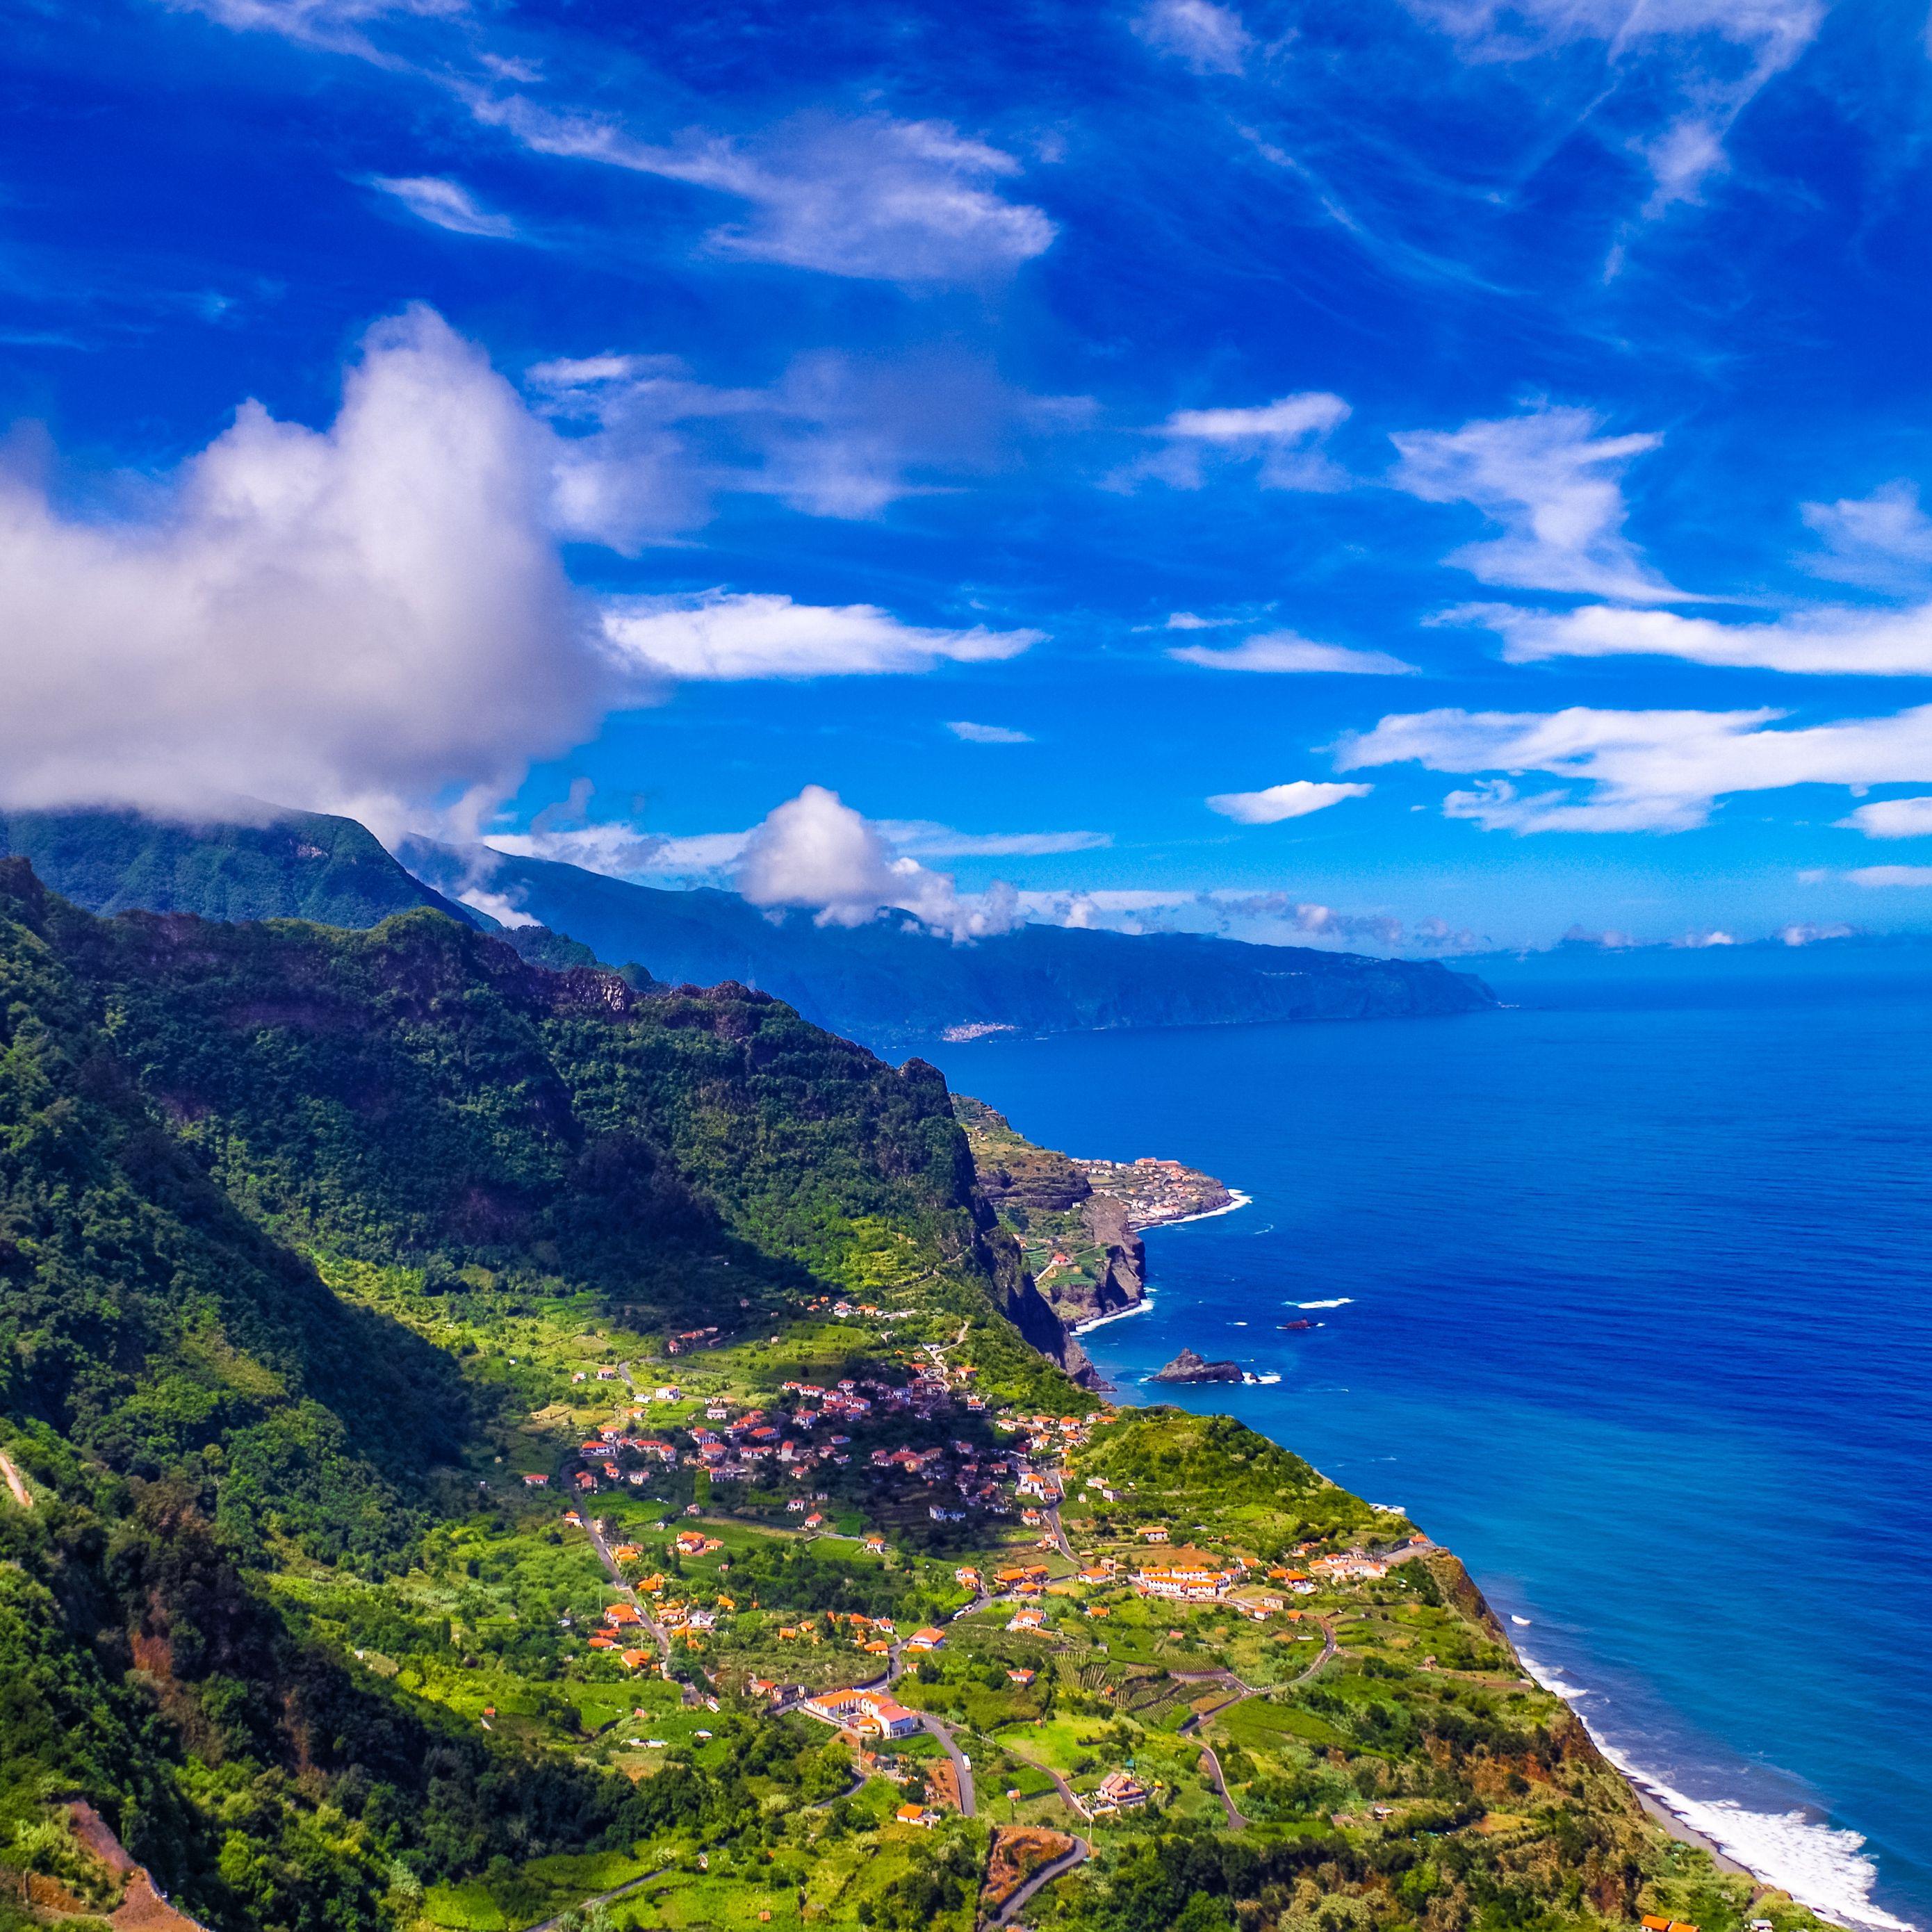 2780x2780 Wallpaper madeira, portugal, island, sea, mountains